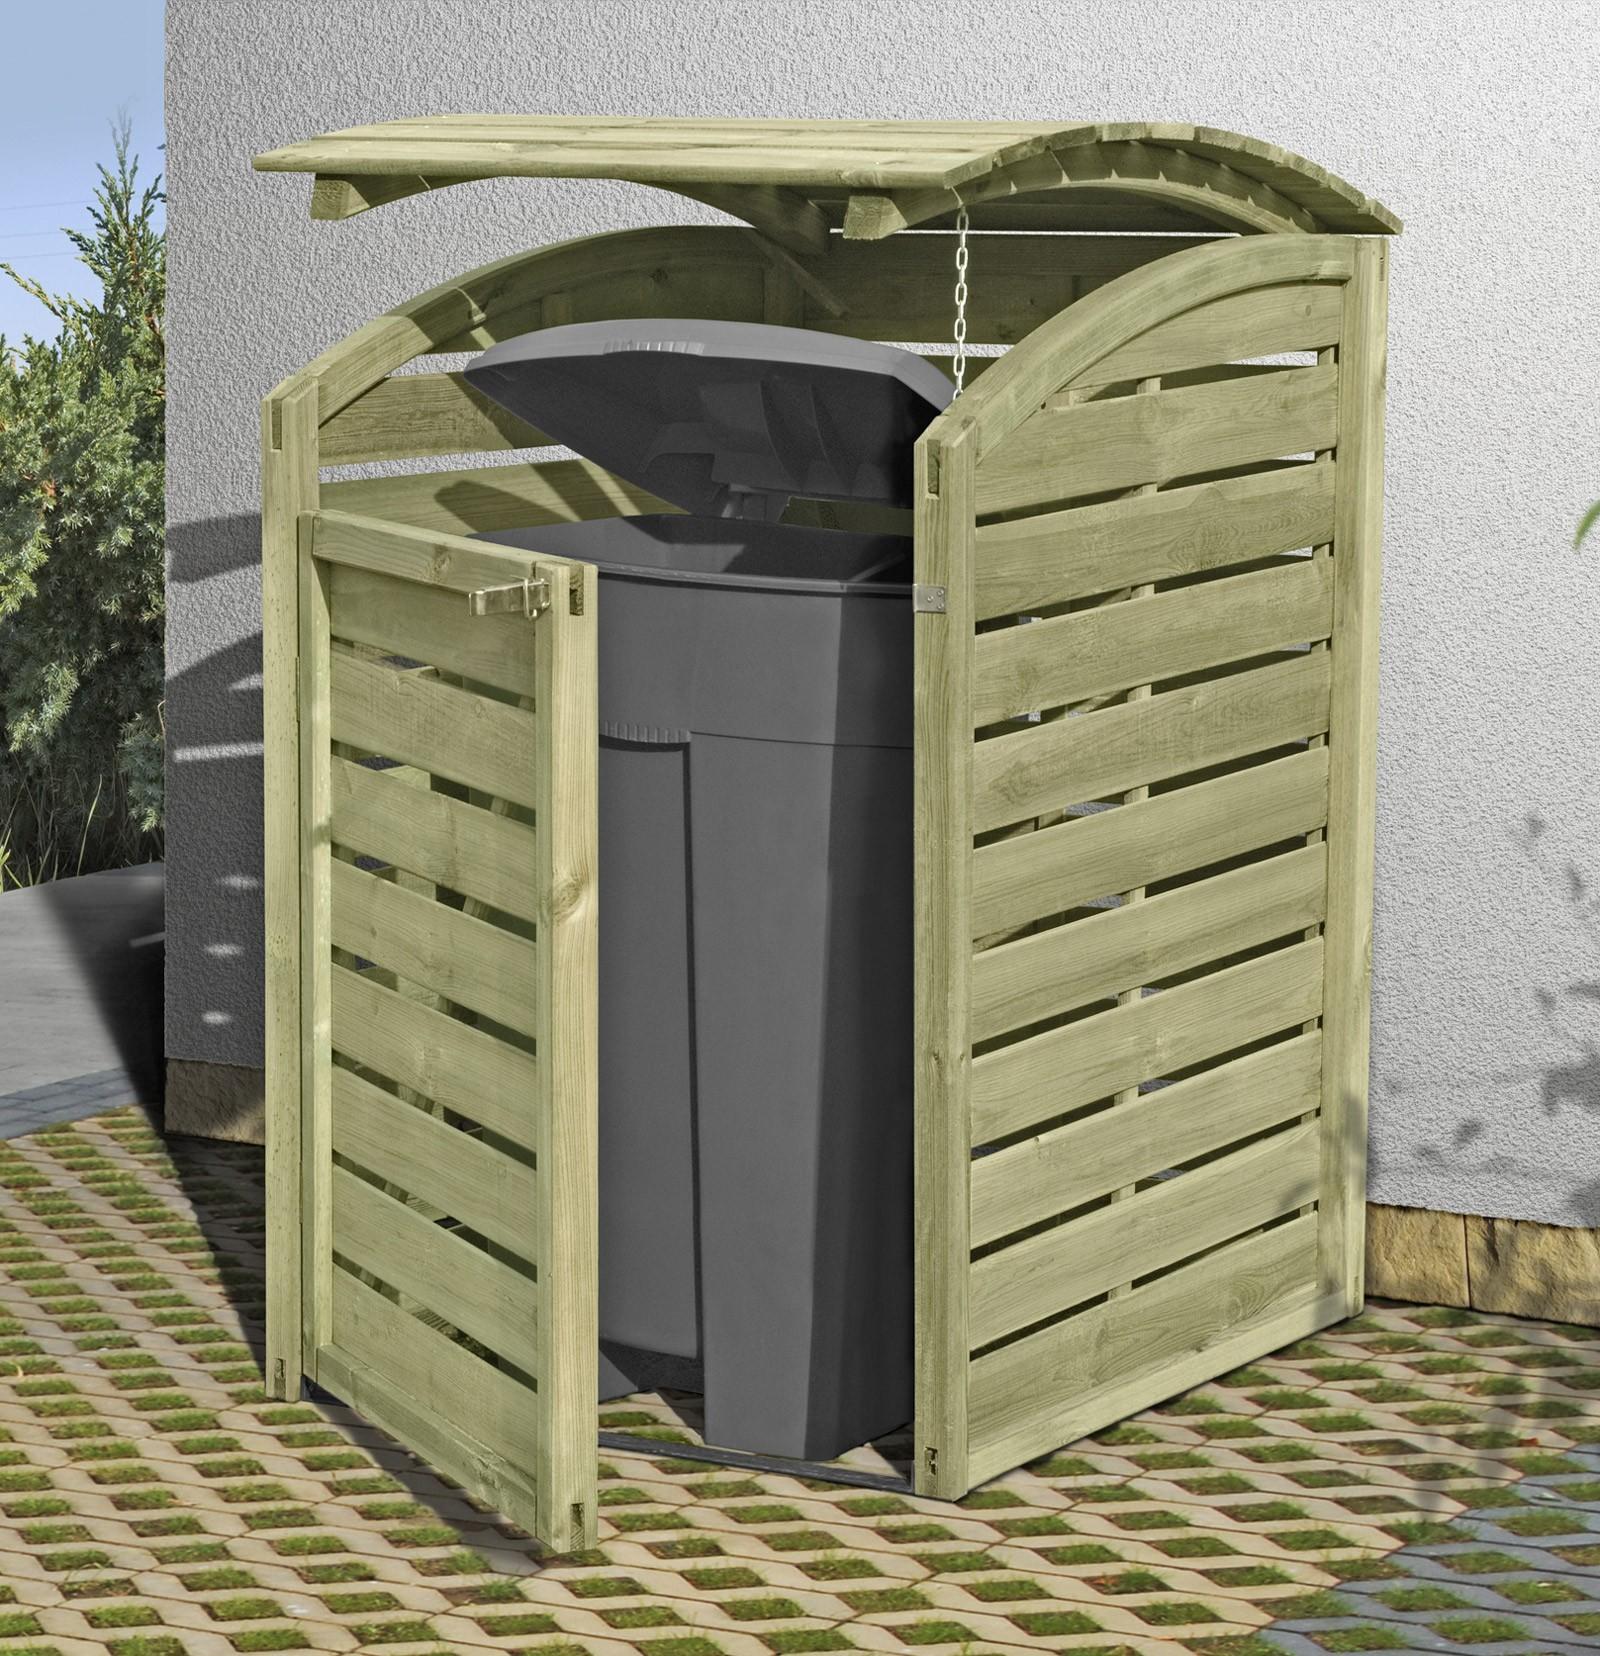 Holz Mülltonnenbox für 1 x 240 Liter Mülltonne kdi Bild 1